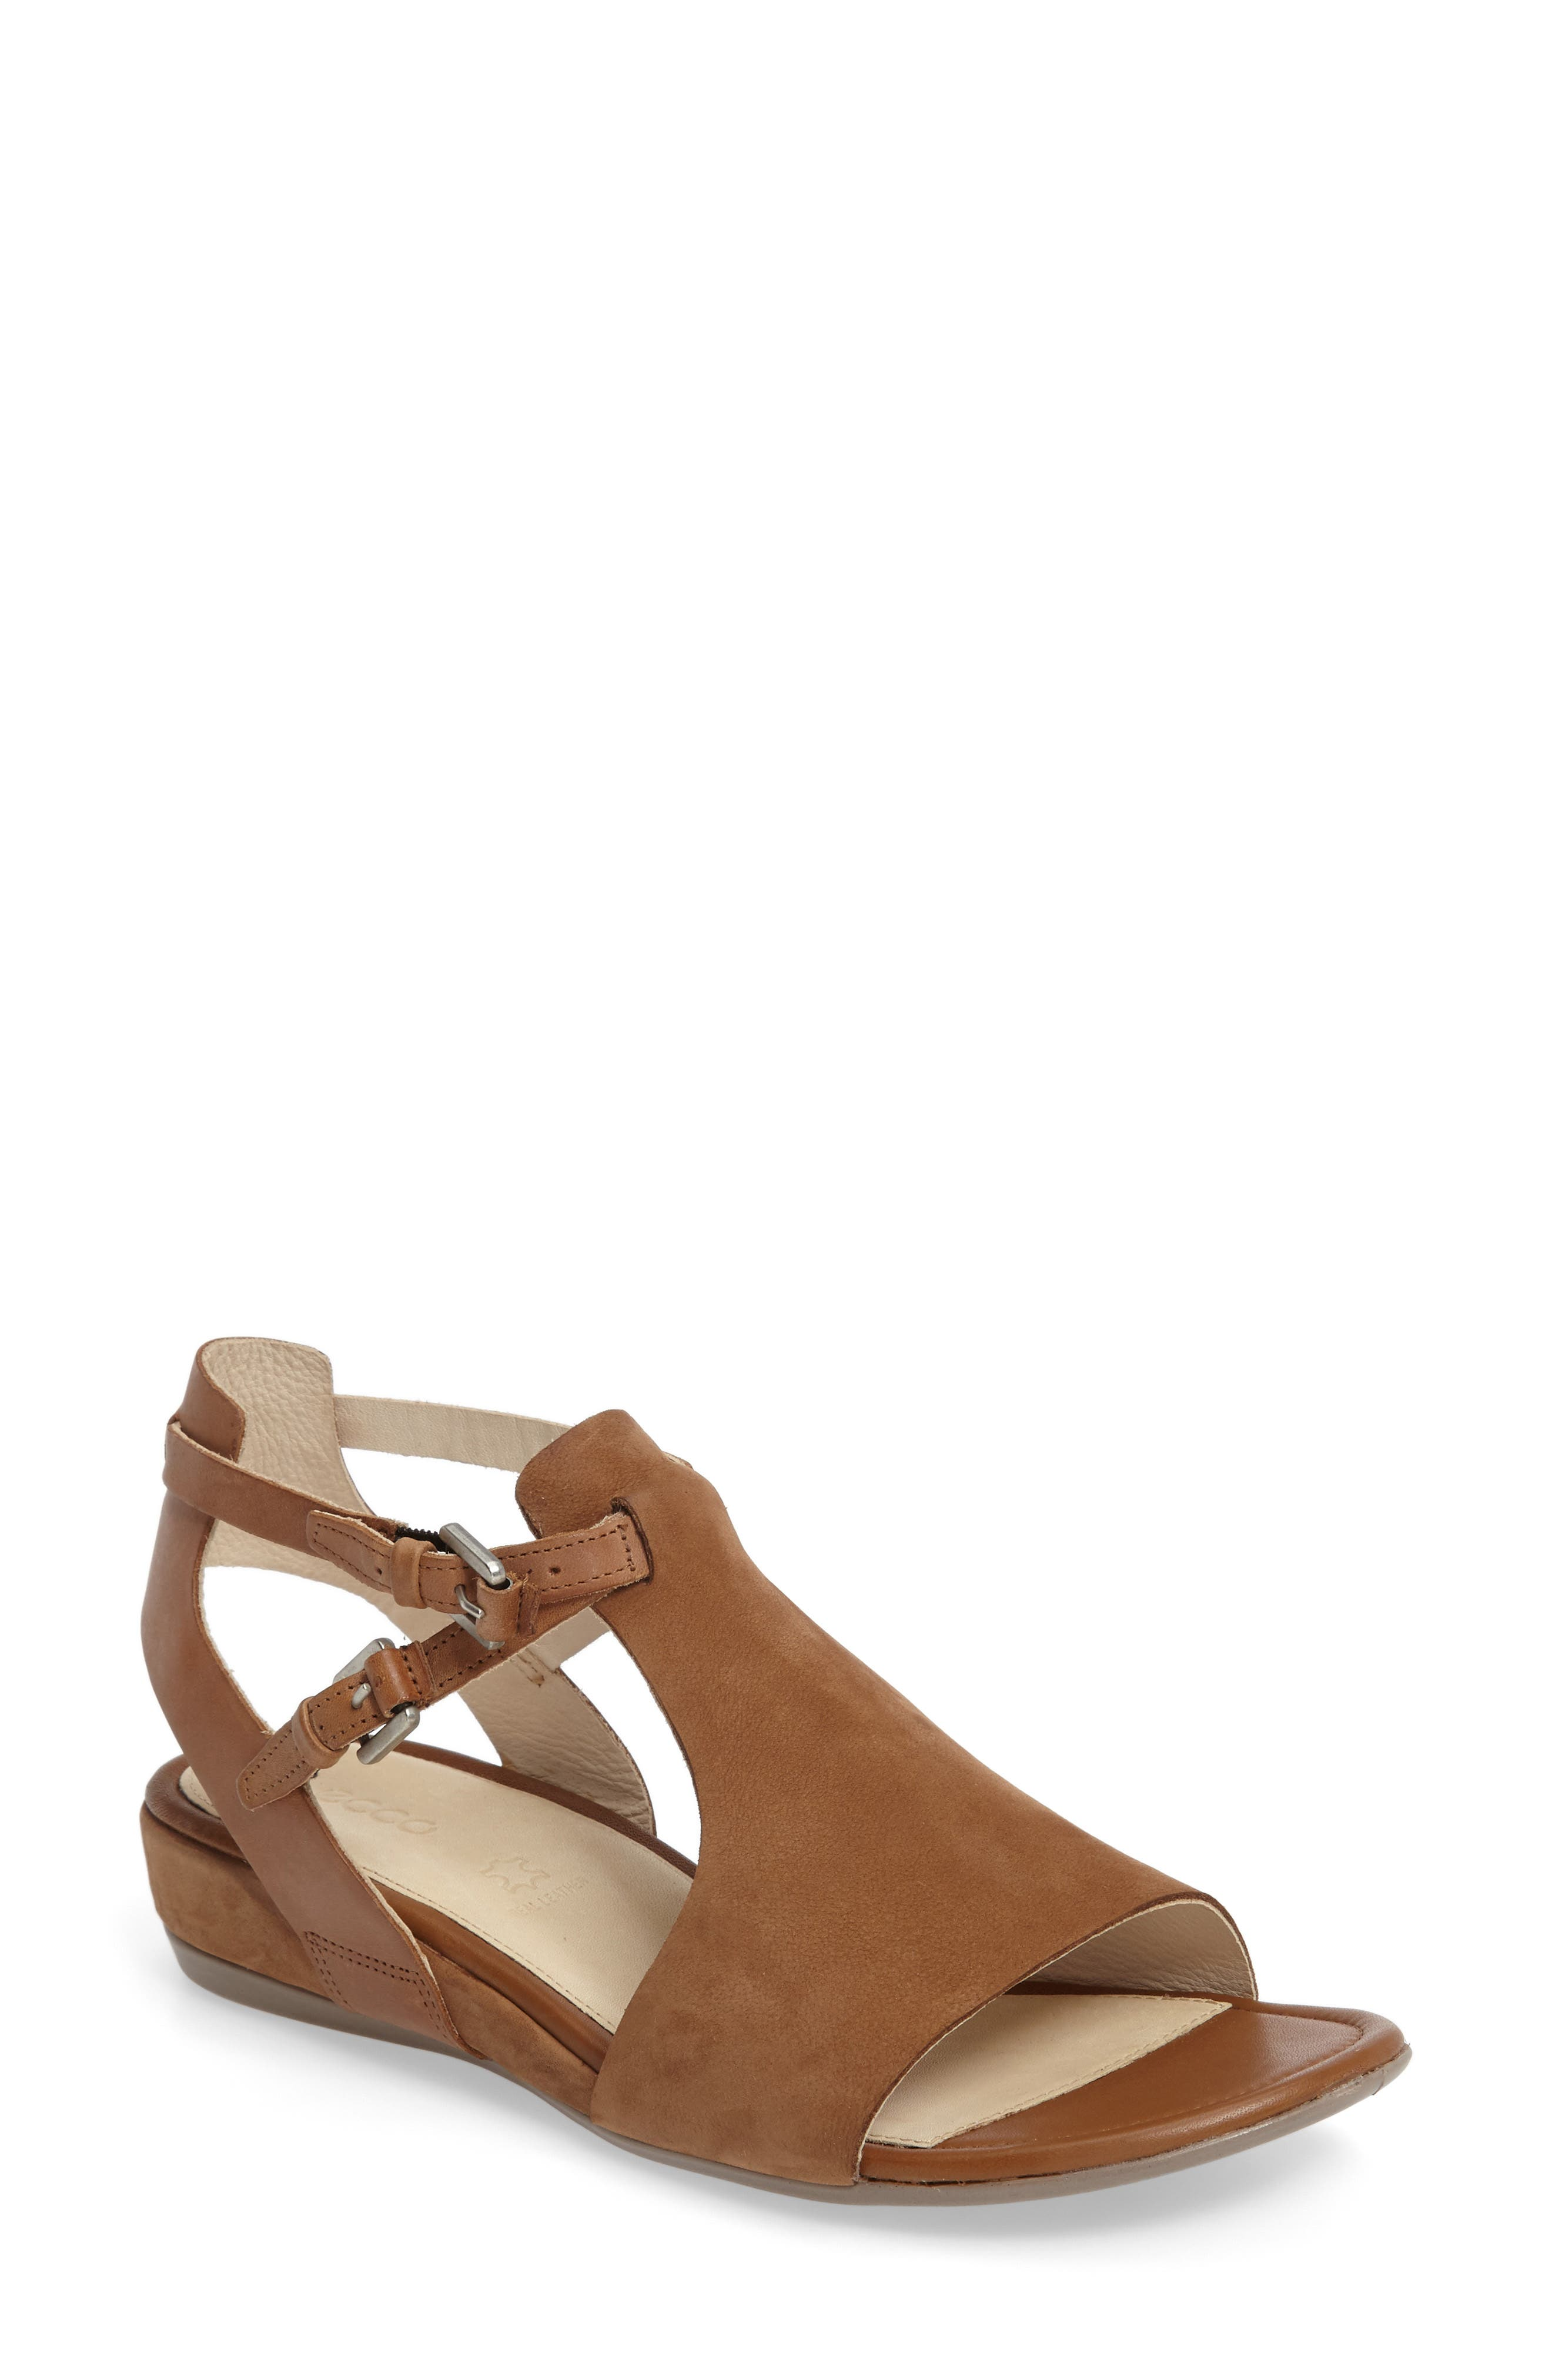 Main Image - ECCO 'Touch 25' Sandal (Women)